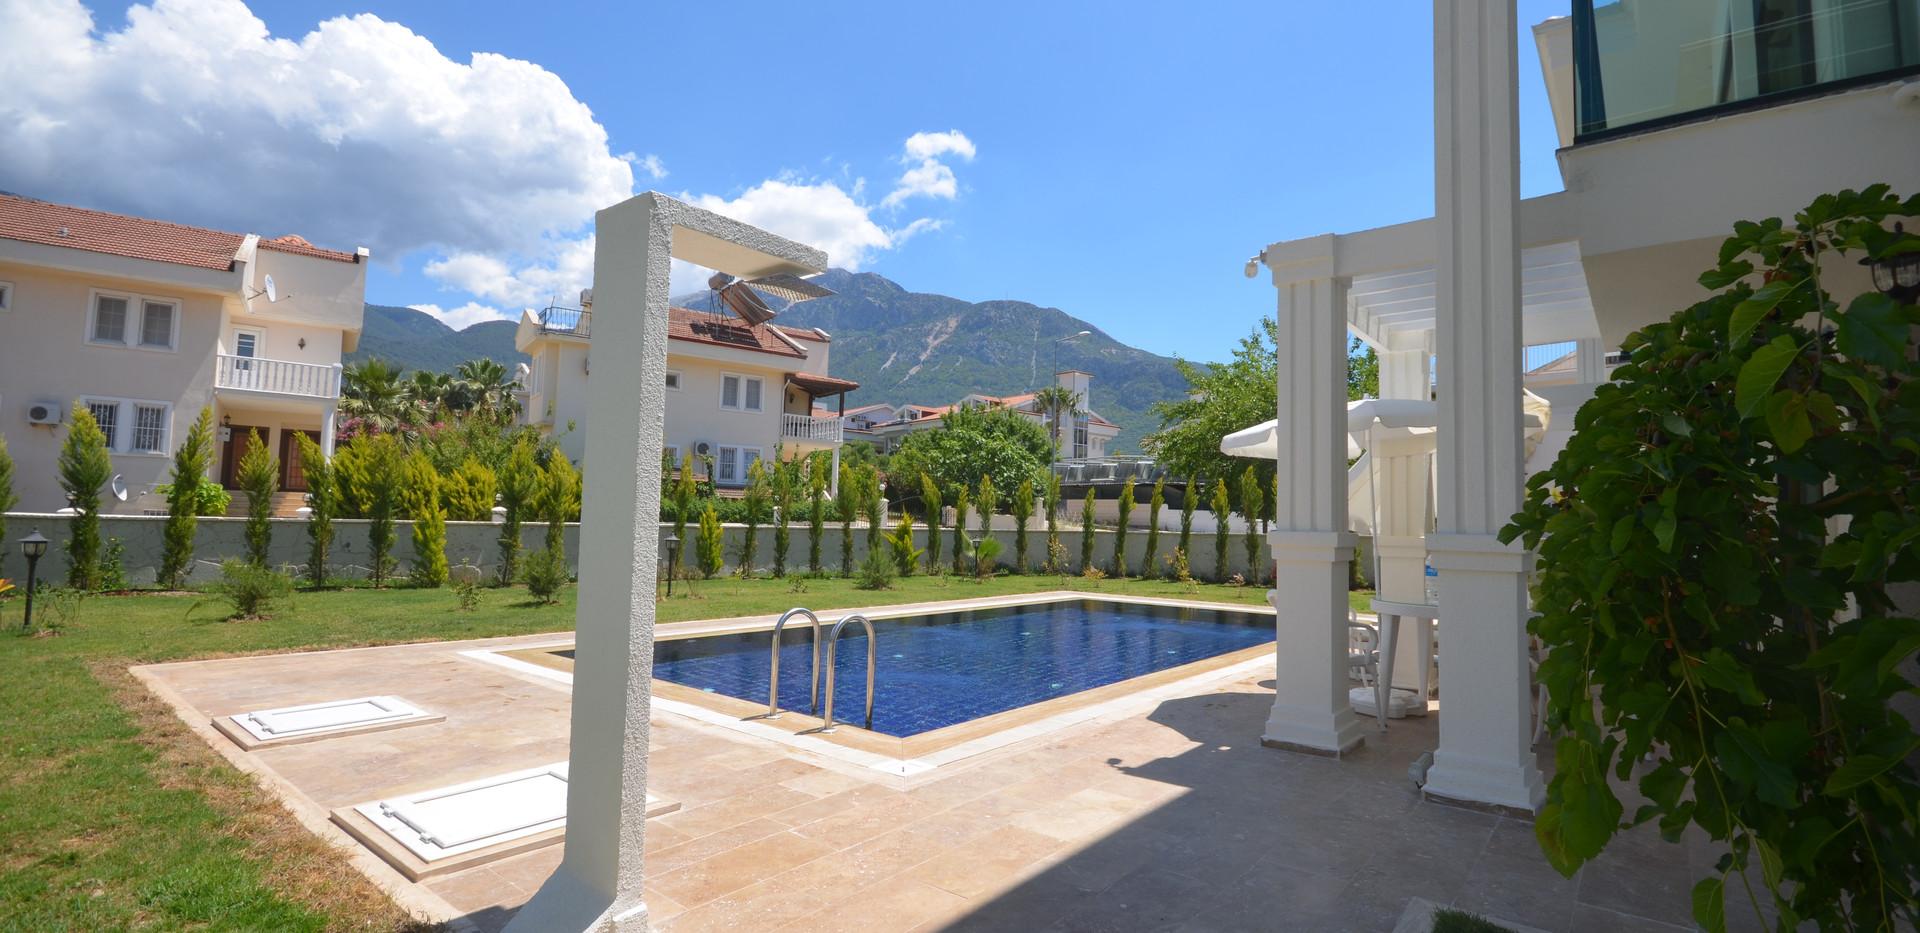 Poolside Shower, Enclosed Gardens